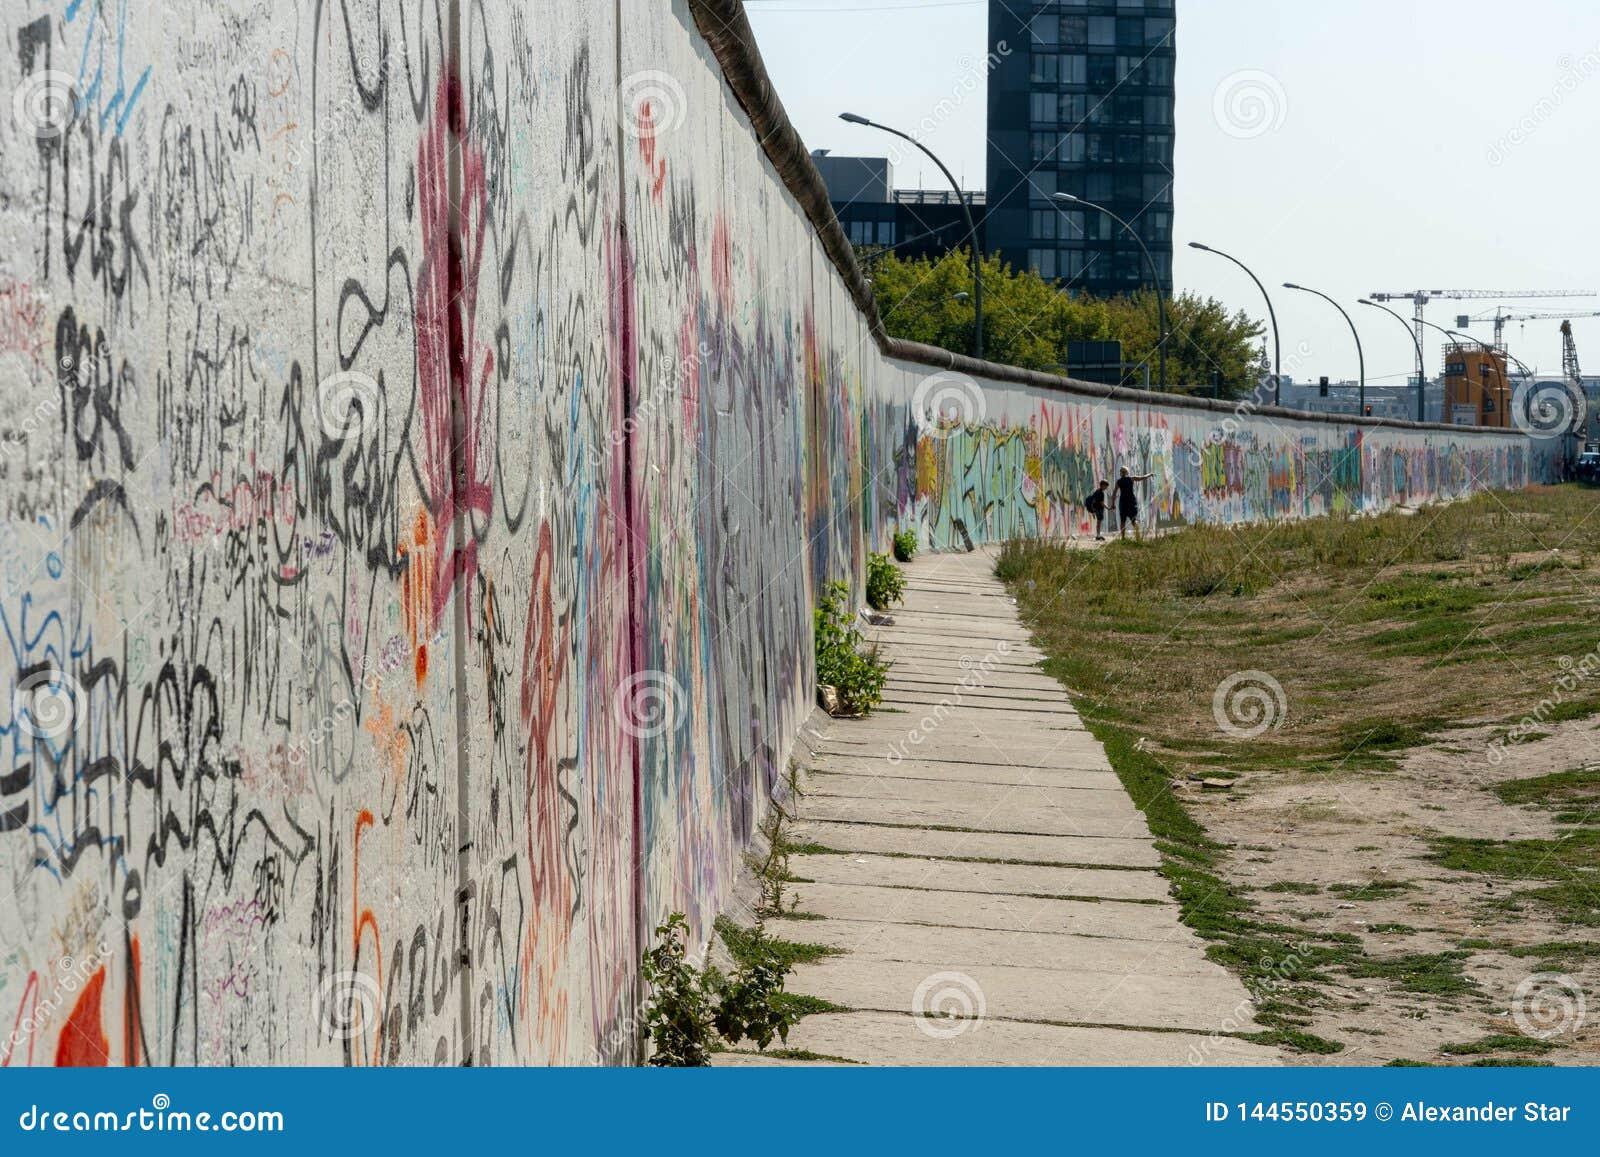 Berlin Wall street art on the wall